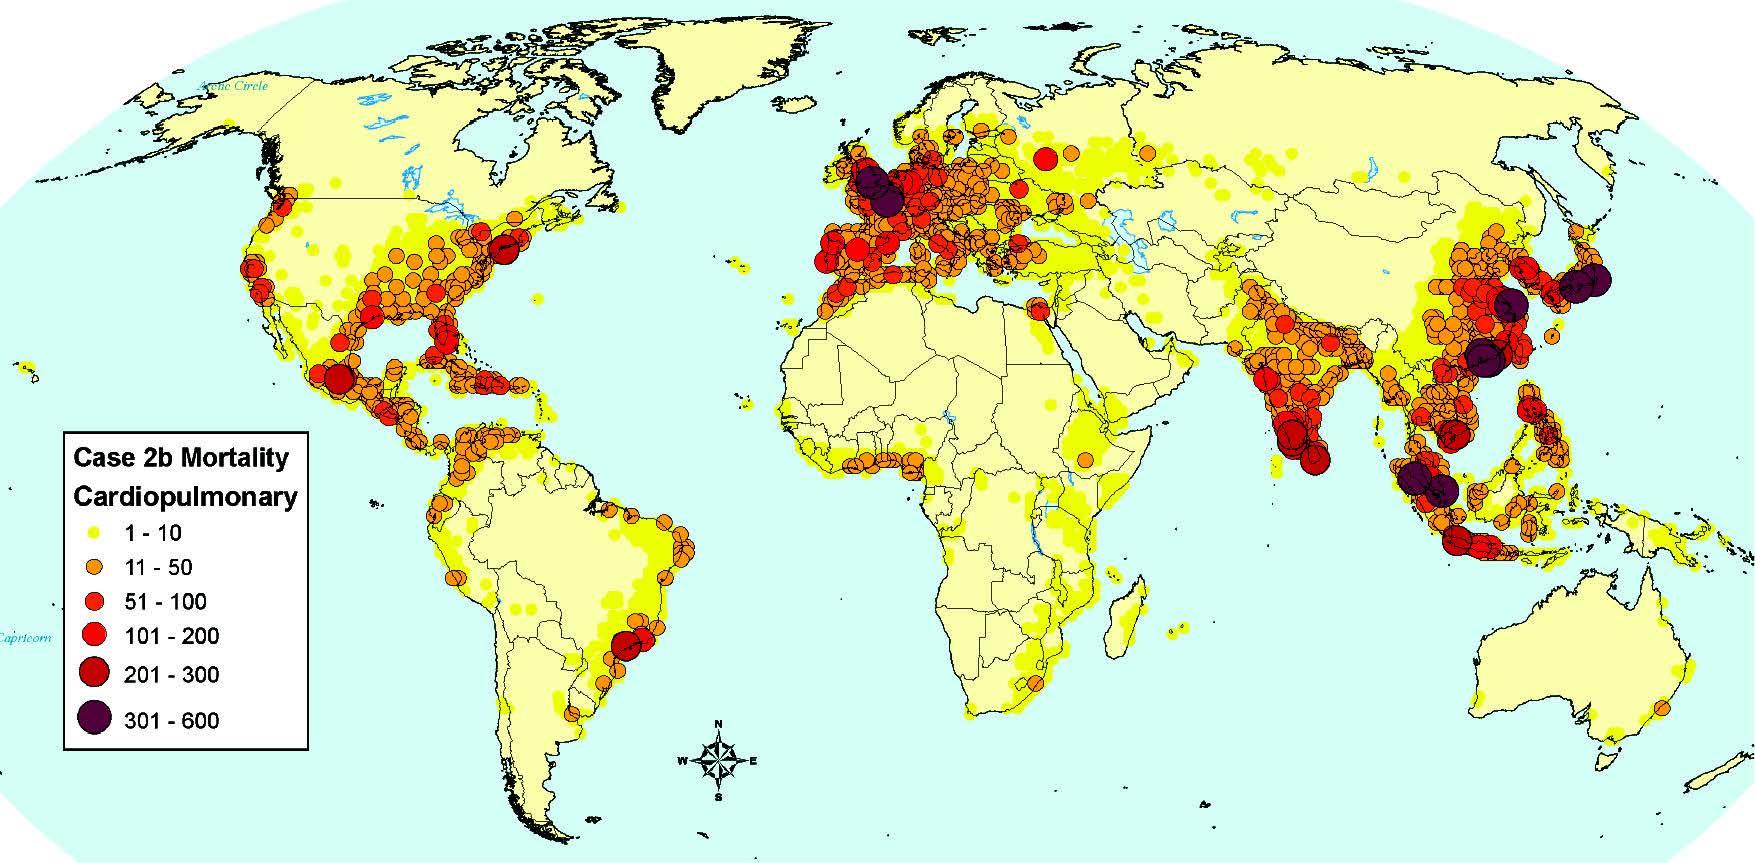 Cardiopulmonary mortality attributable to ship PM2.5 emissions worldwide.jpg